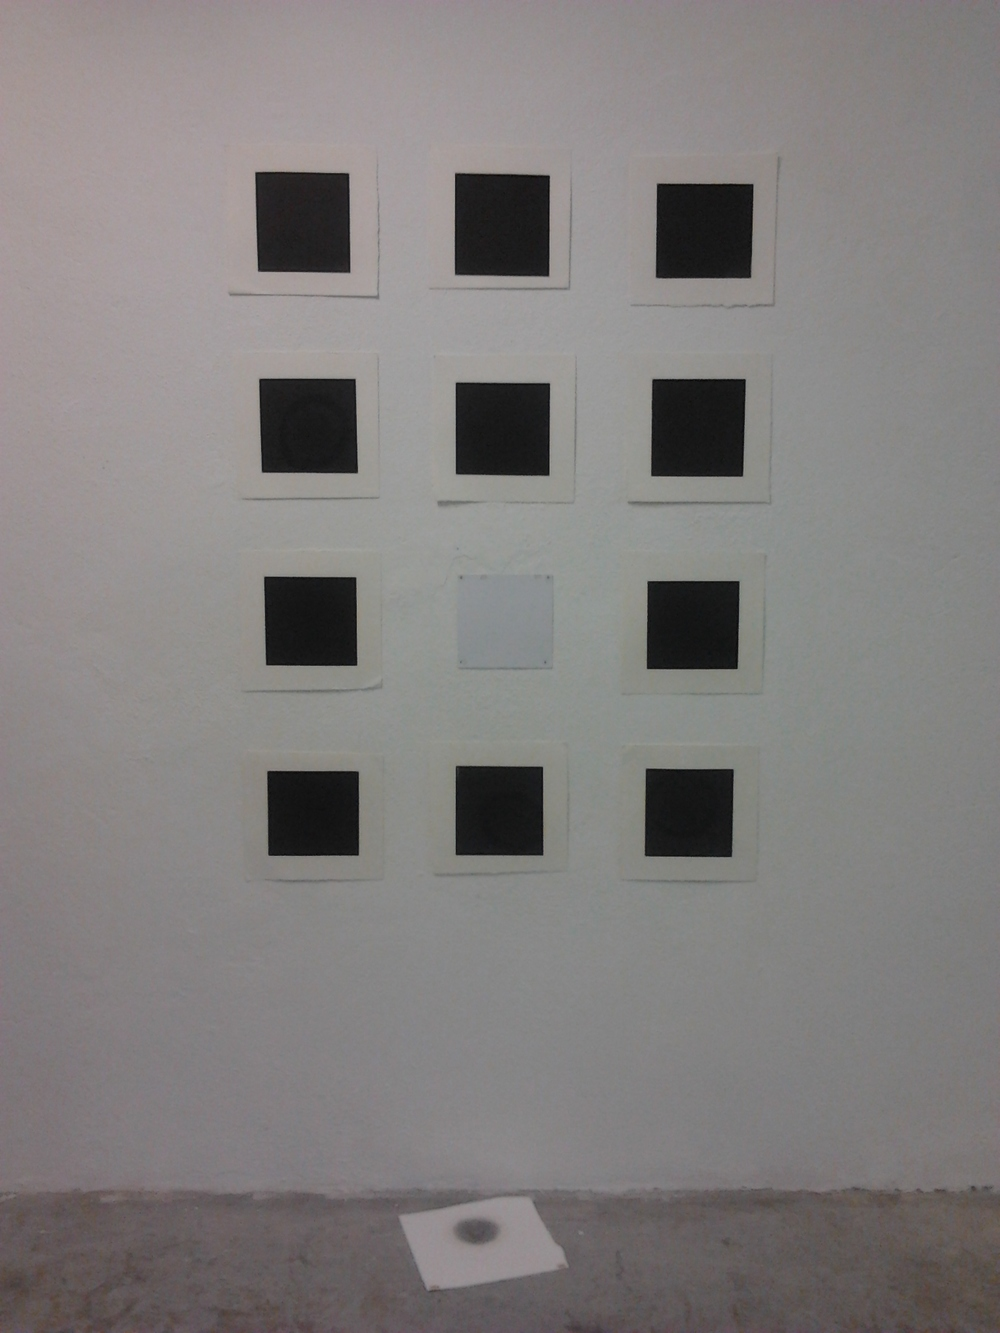 Copy of 2012-11-17 14.10.12.jpg